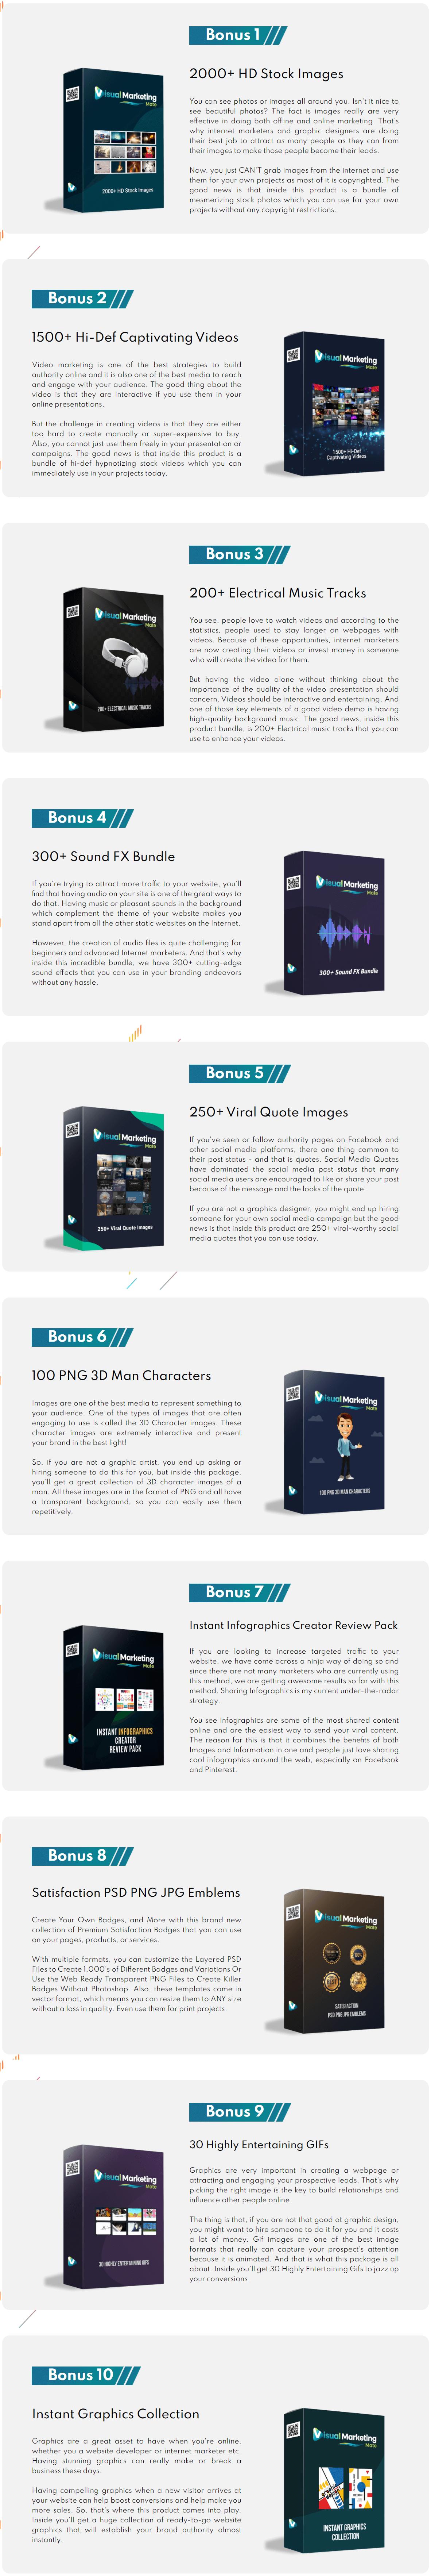 Visual-Marketing-Mate-bonus